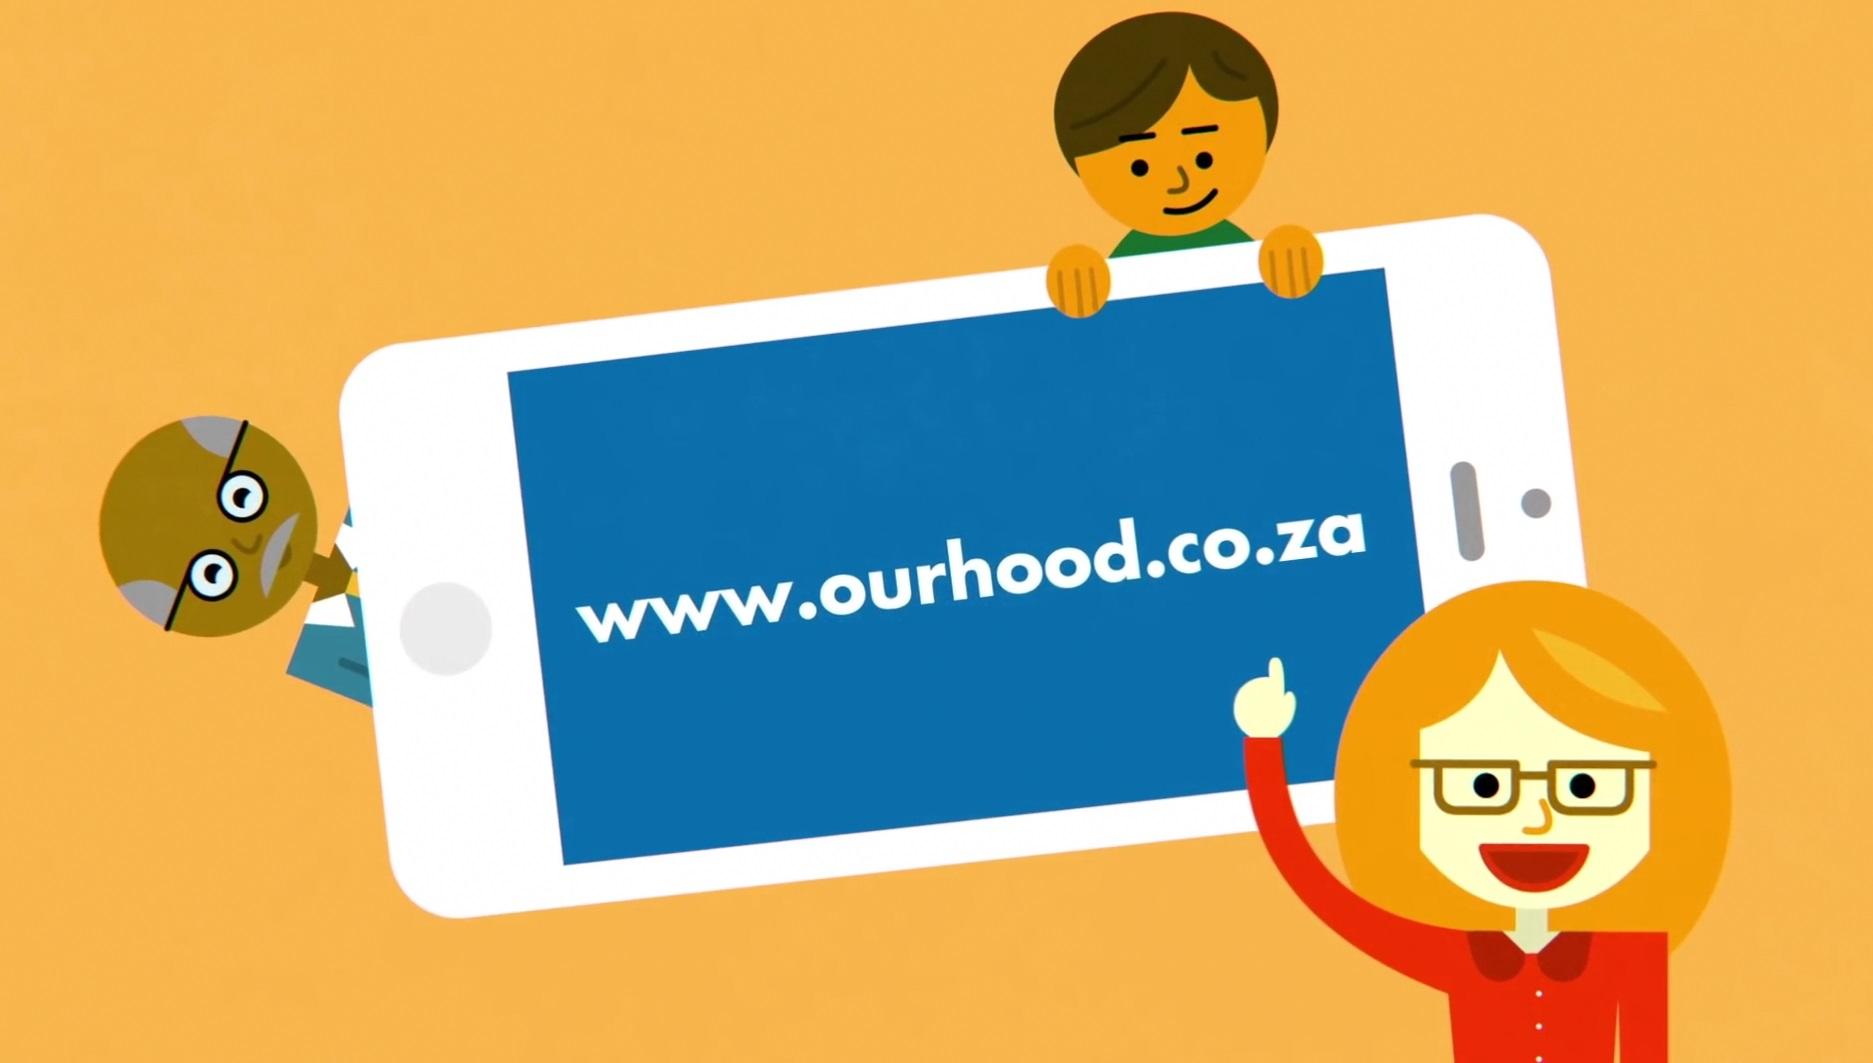 OurHood community app